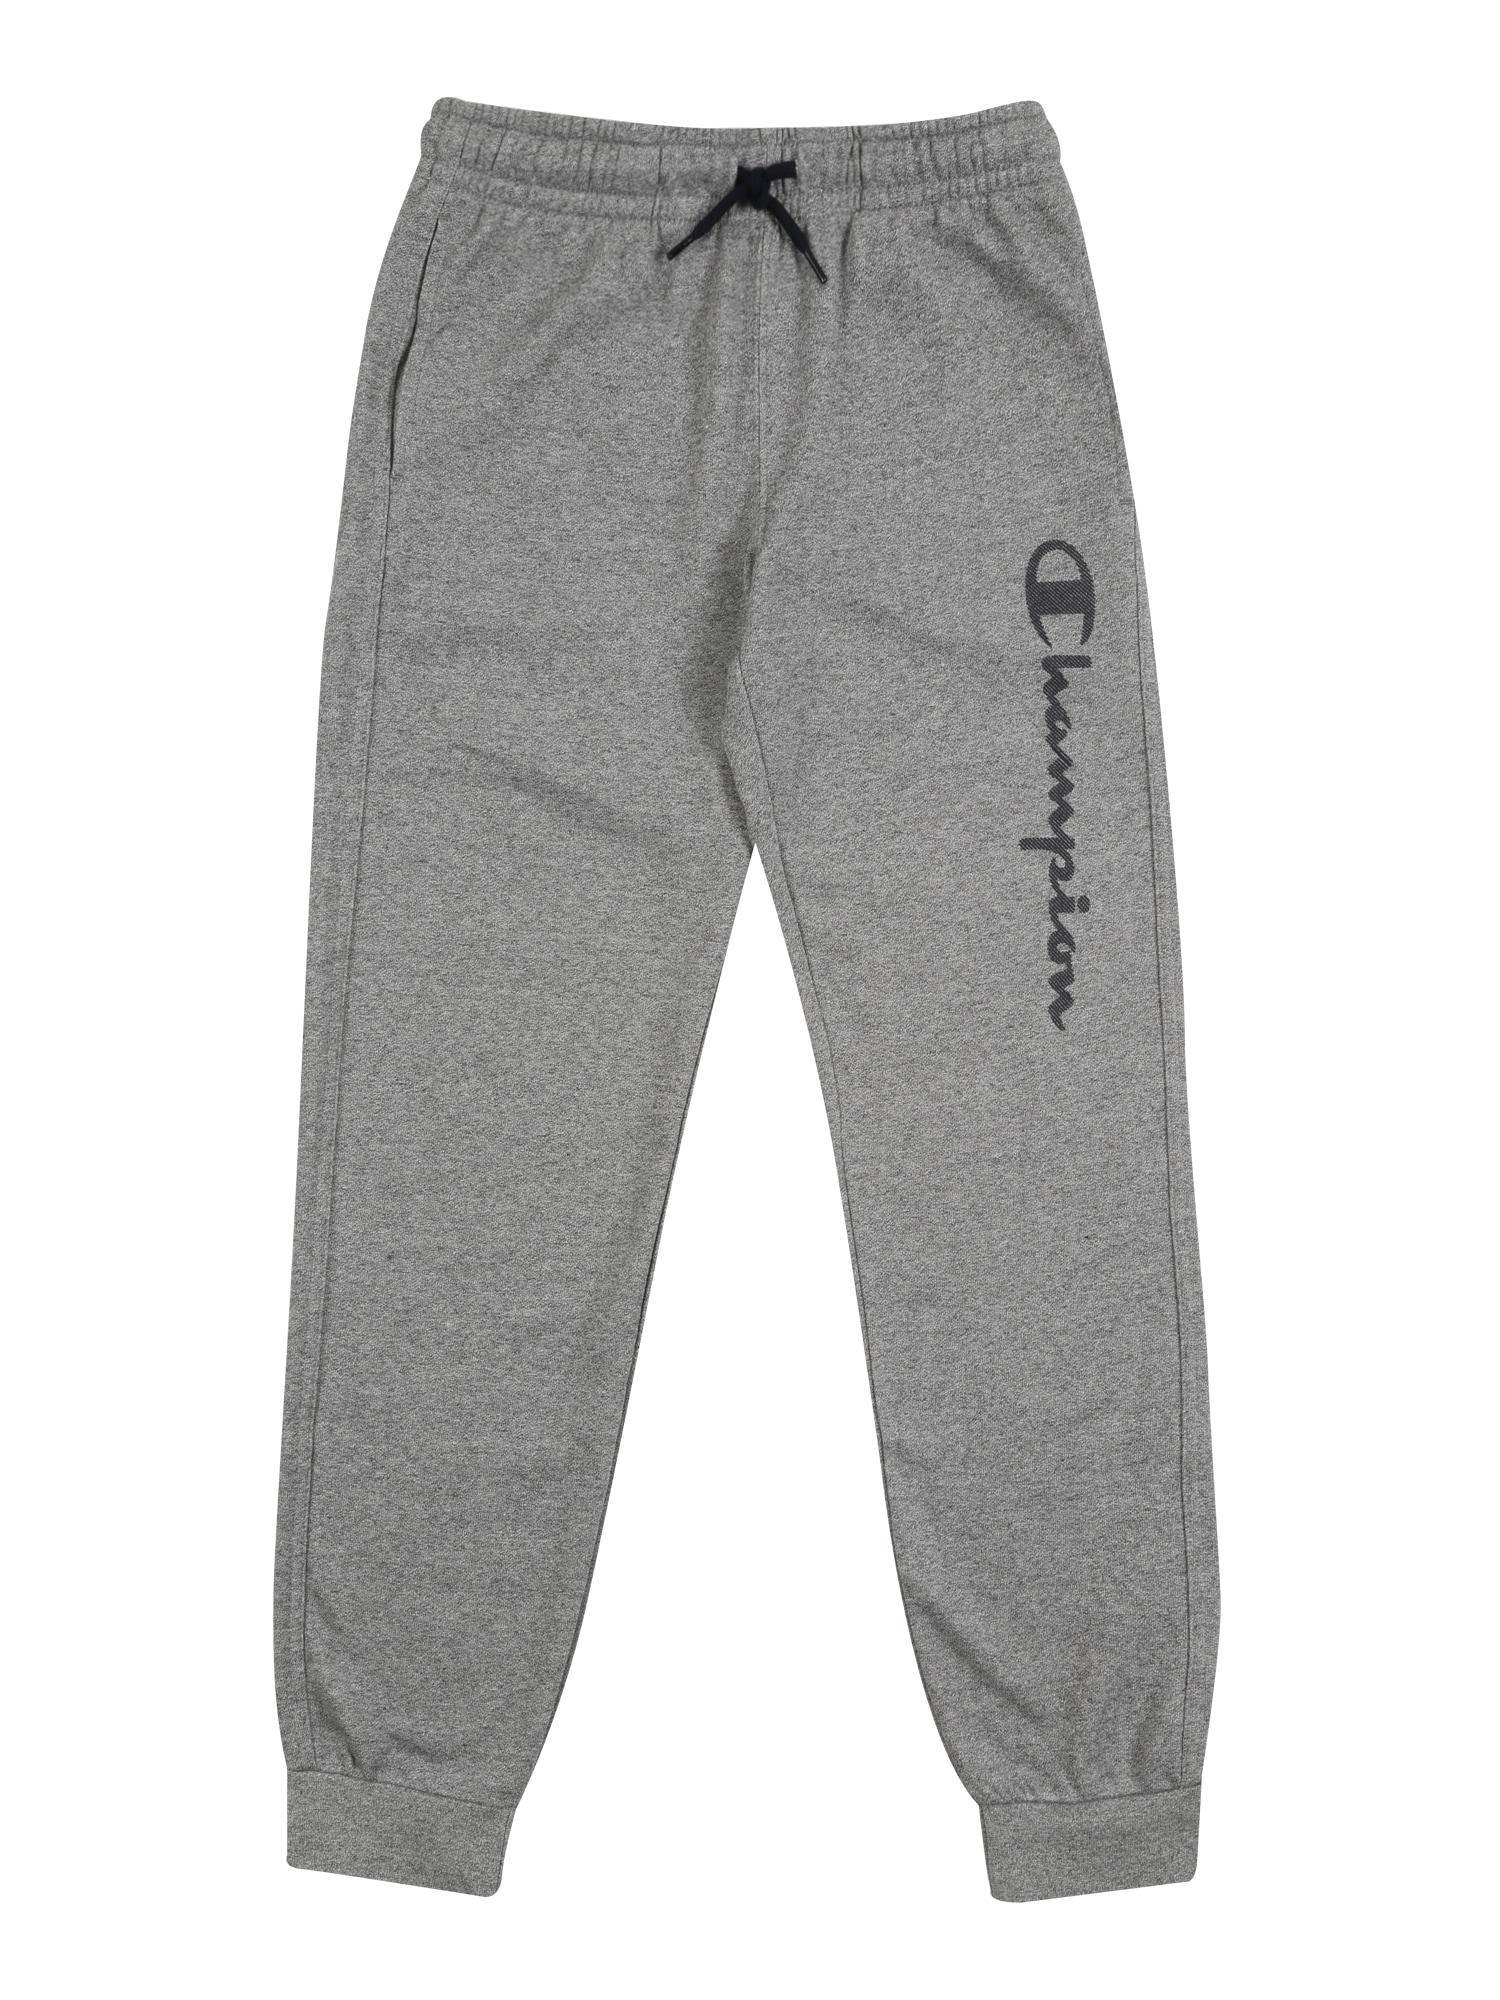 Champion Authentic Athletic Apparel Športové nohavice 'RIB CUFF'  sivá melírovaná